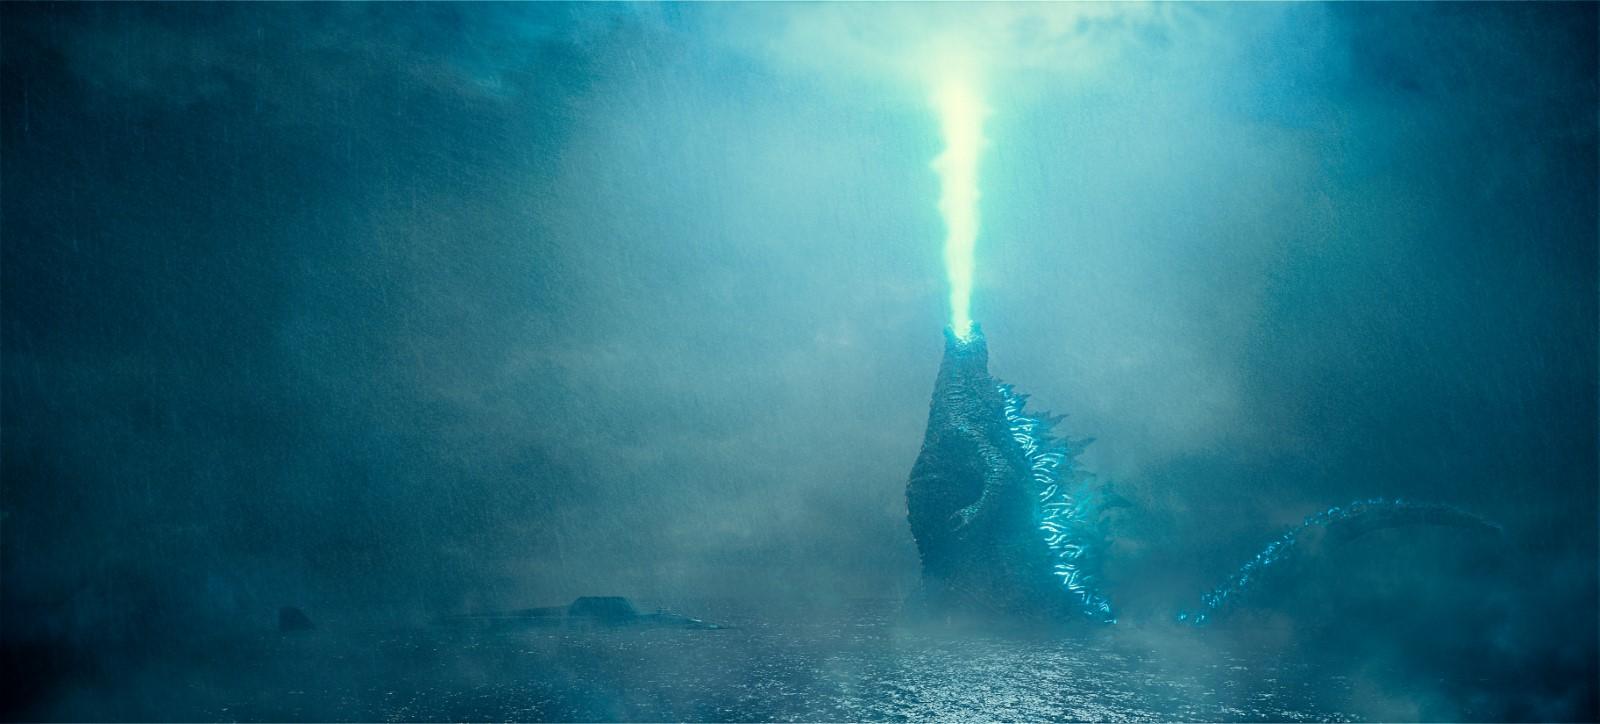 [Films] Godzilla 2 : Roi des monstres 5328186